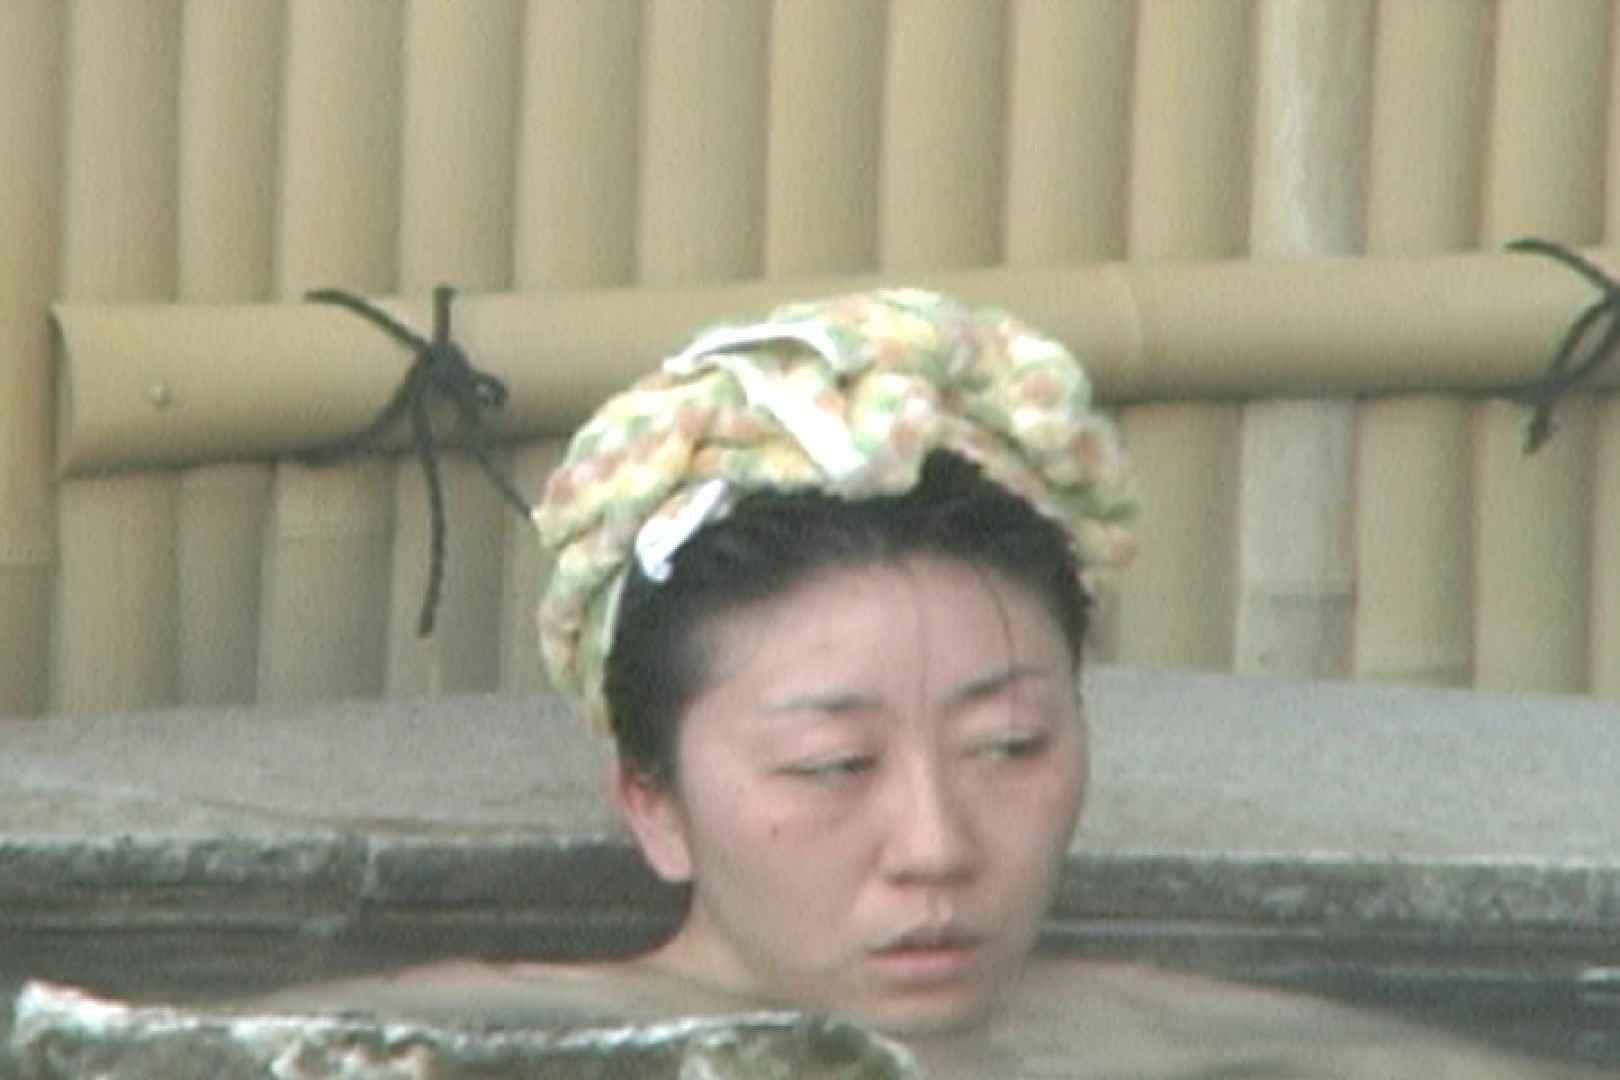 Aquaな露天風呂Vol.594 0   0  90連発 51